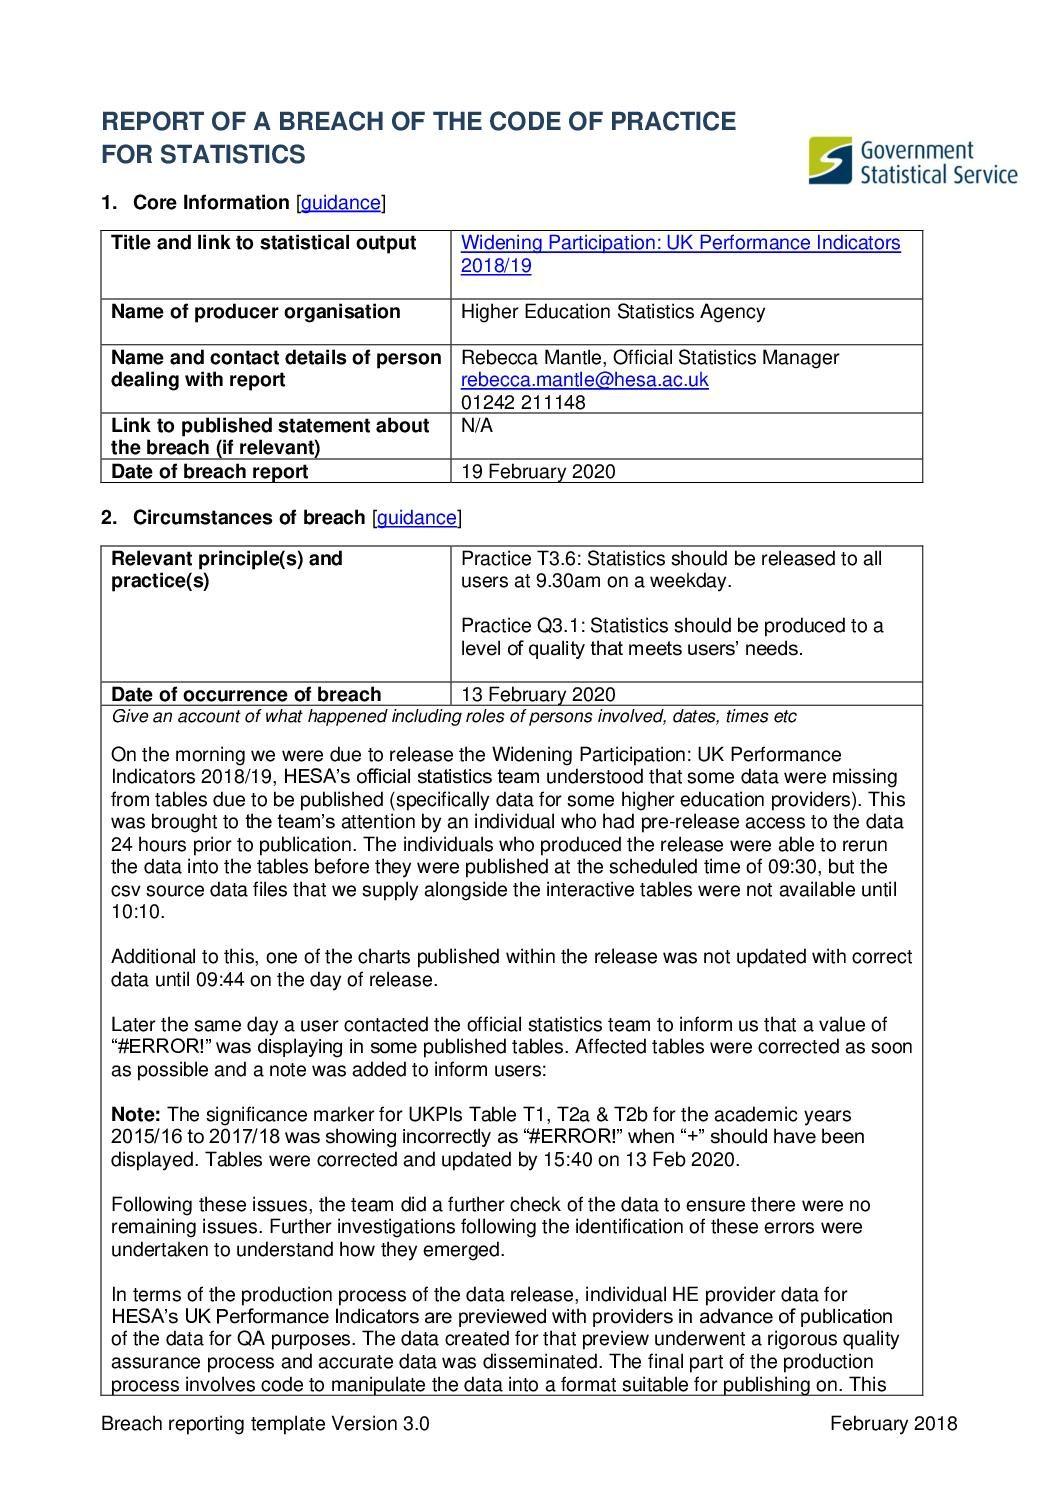 Widening Participation: UK Performance Indicators 2018/19